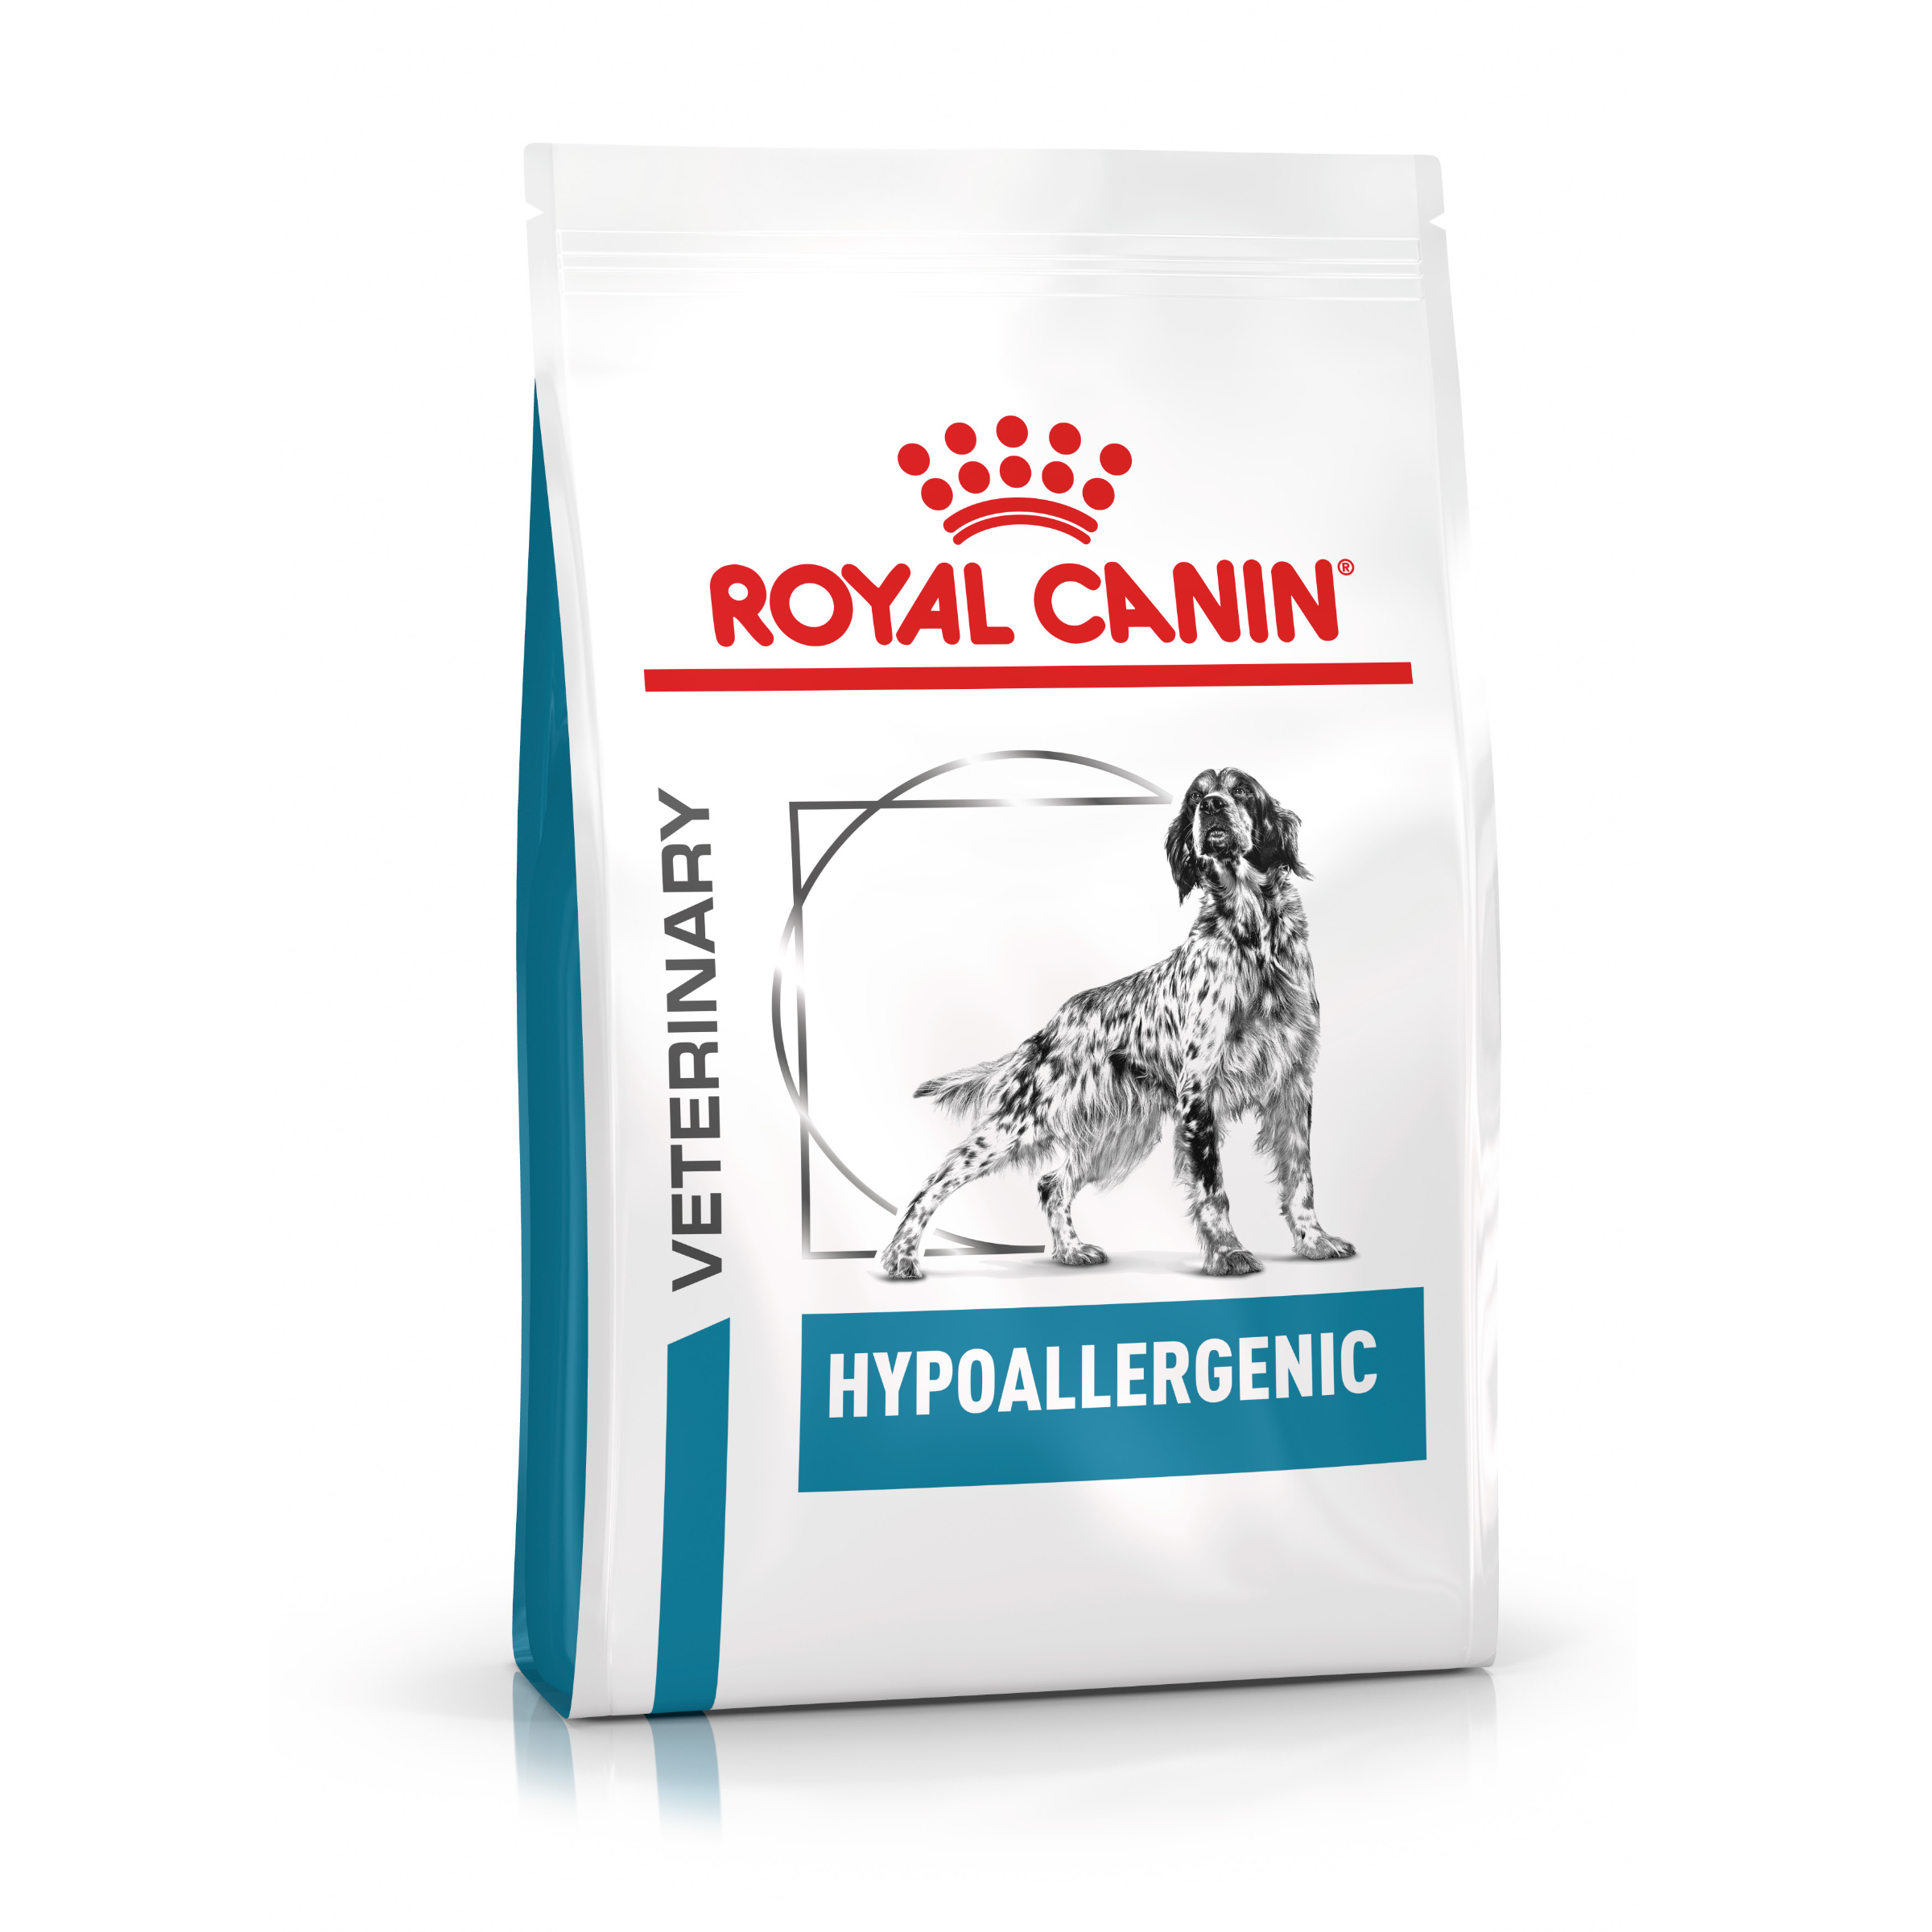 Royal Canin Veterinary Health Nutrition Dog HYPOALLERGENIC - 7kg